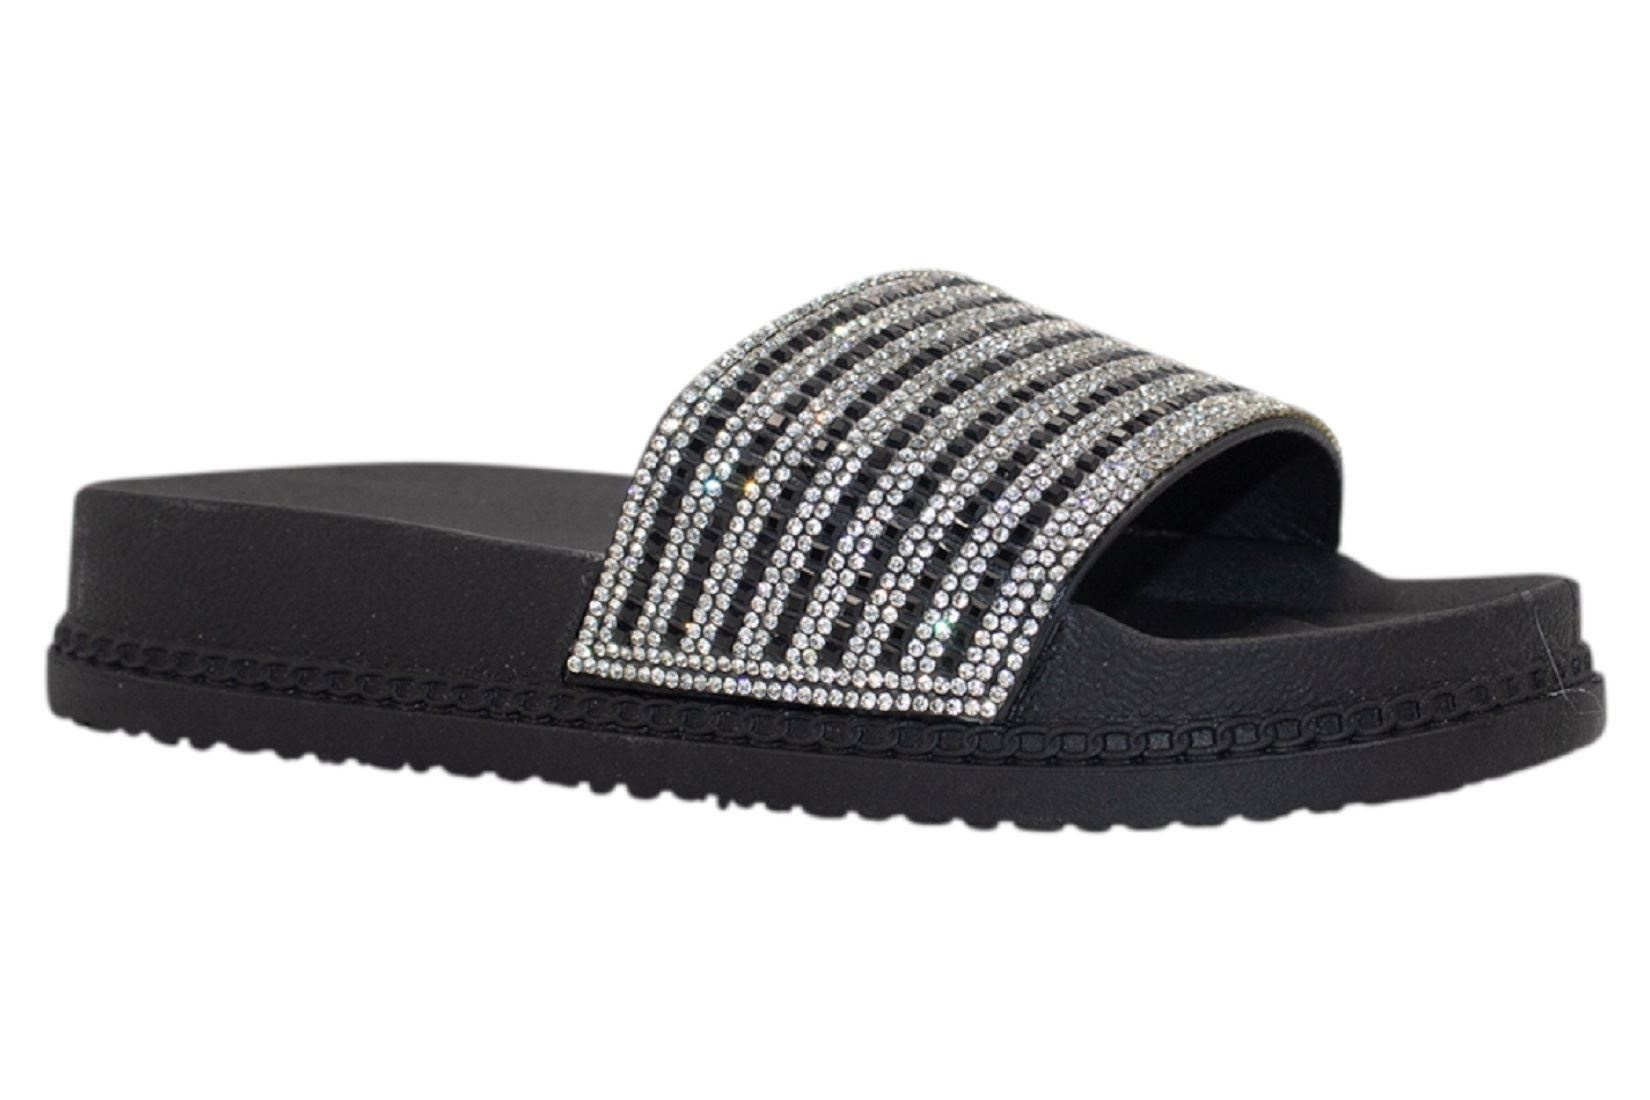 Womens-Sliders-Casual-Slippers-Mules-Ladies-Diamante-Flip-Flop-Sandals-Shoes thumbnail 69